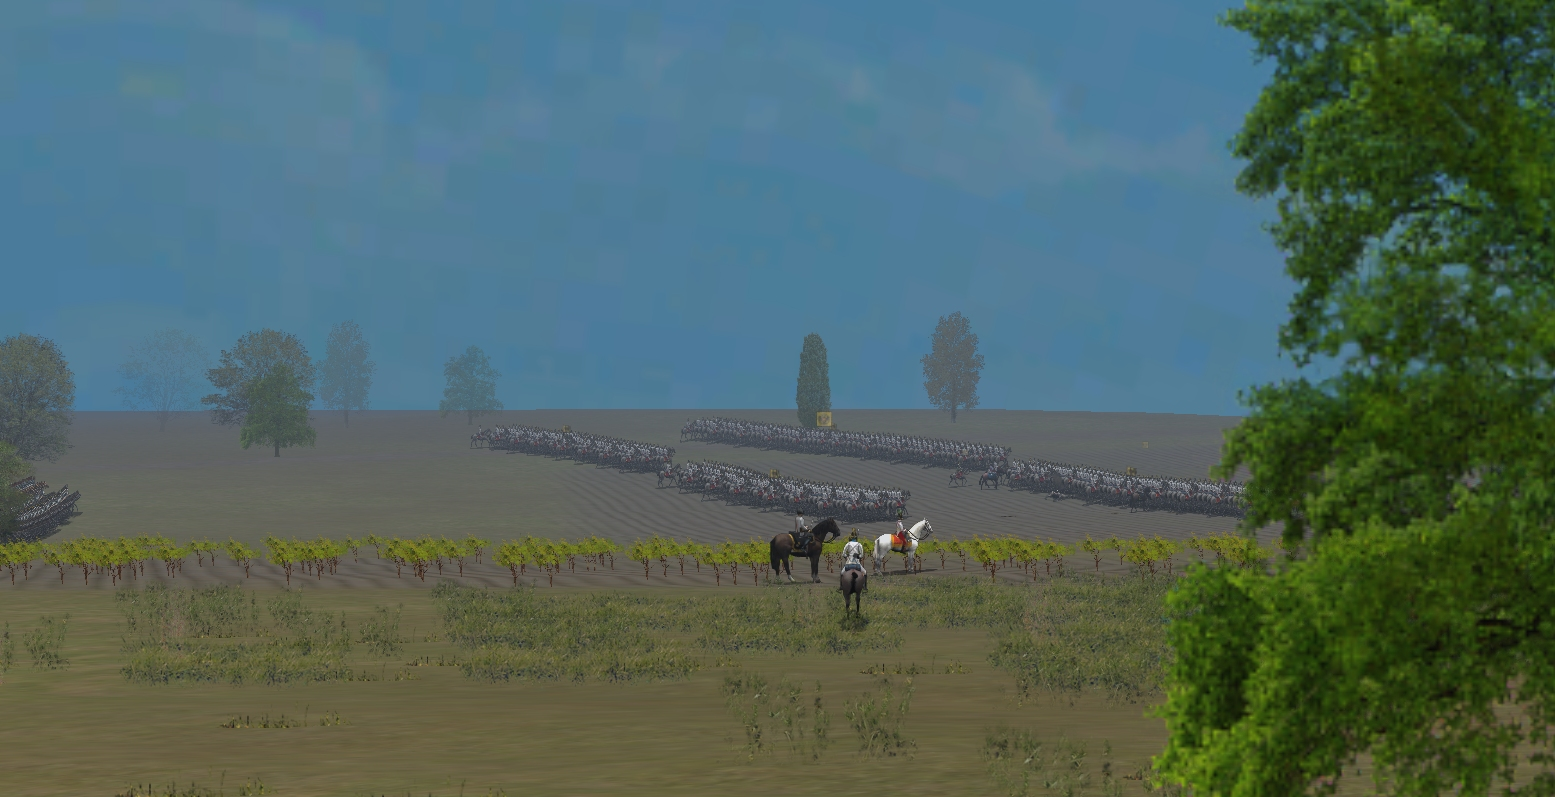 1805 Campaign on the Danube Screen0019